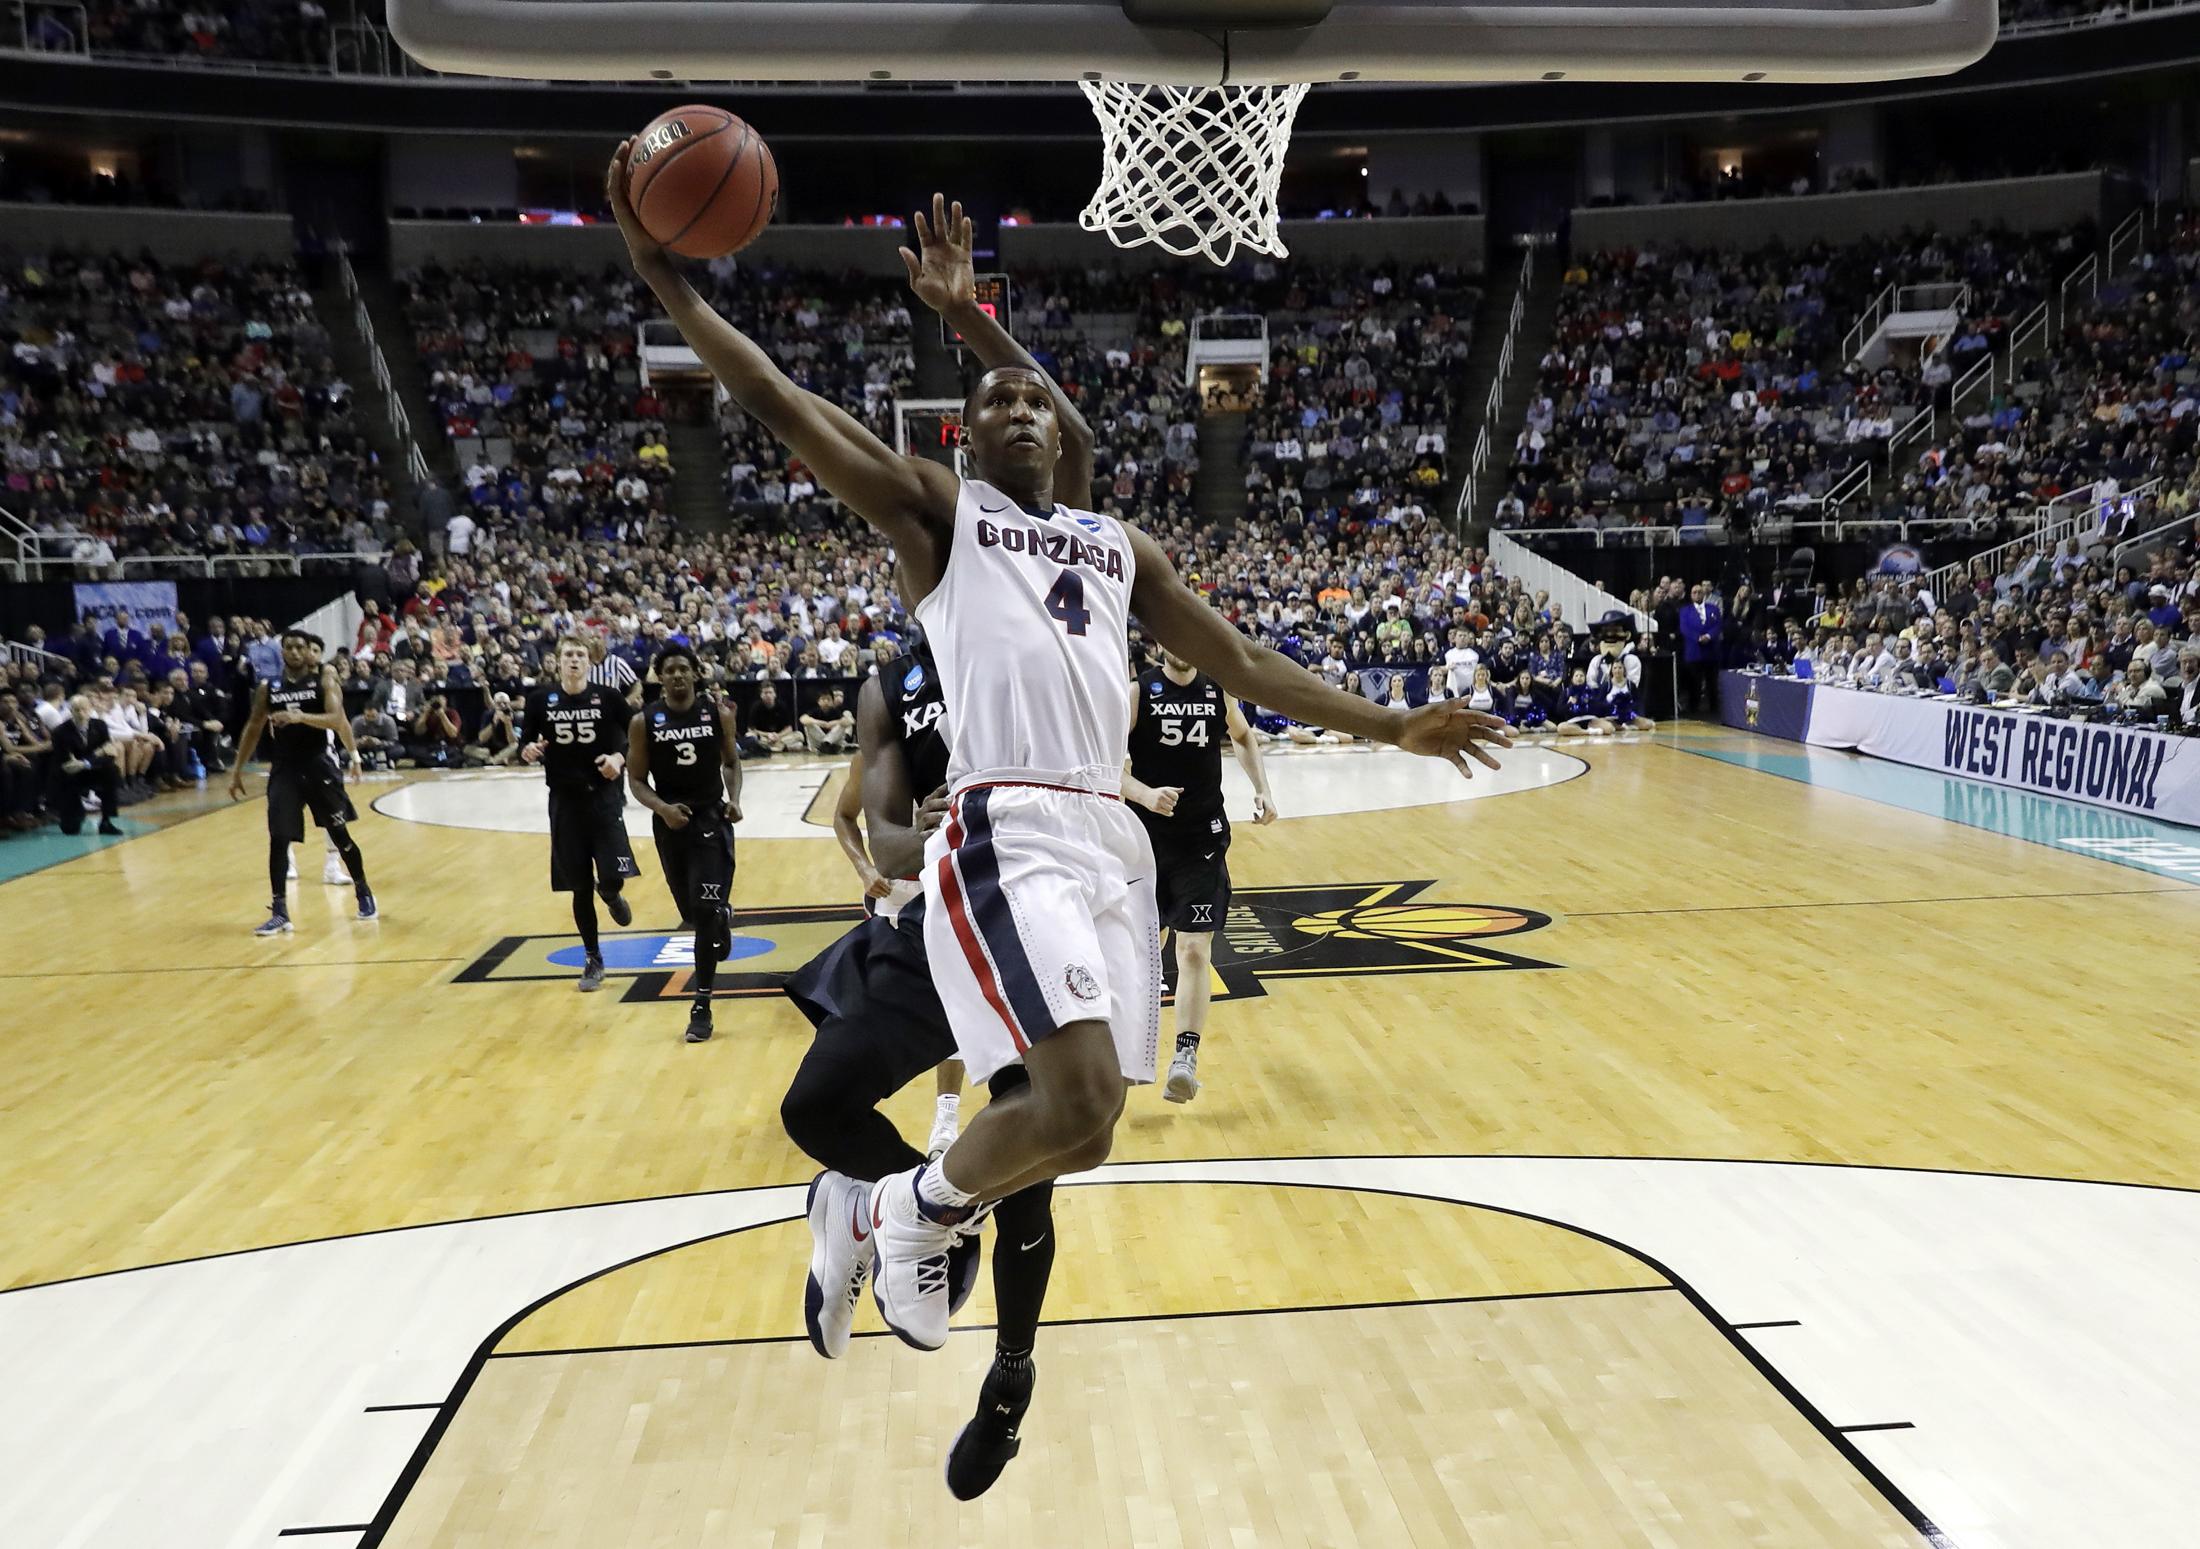 Gonzaga guard Jordan Mathews (4) drives to the basket against Xavier during the second half of an NCAA Tournament college basketball regional final game Saturday, March 25, 2017, in San Jose, Calif. (Tony Avelar/AP)